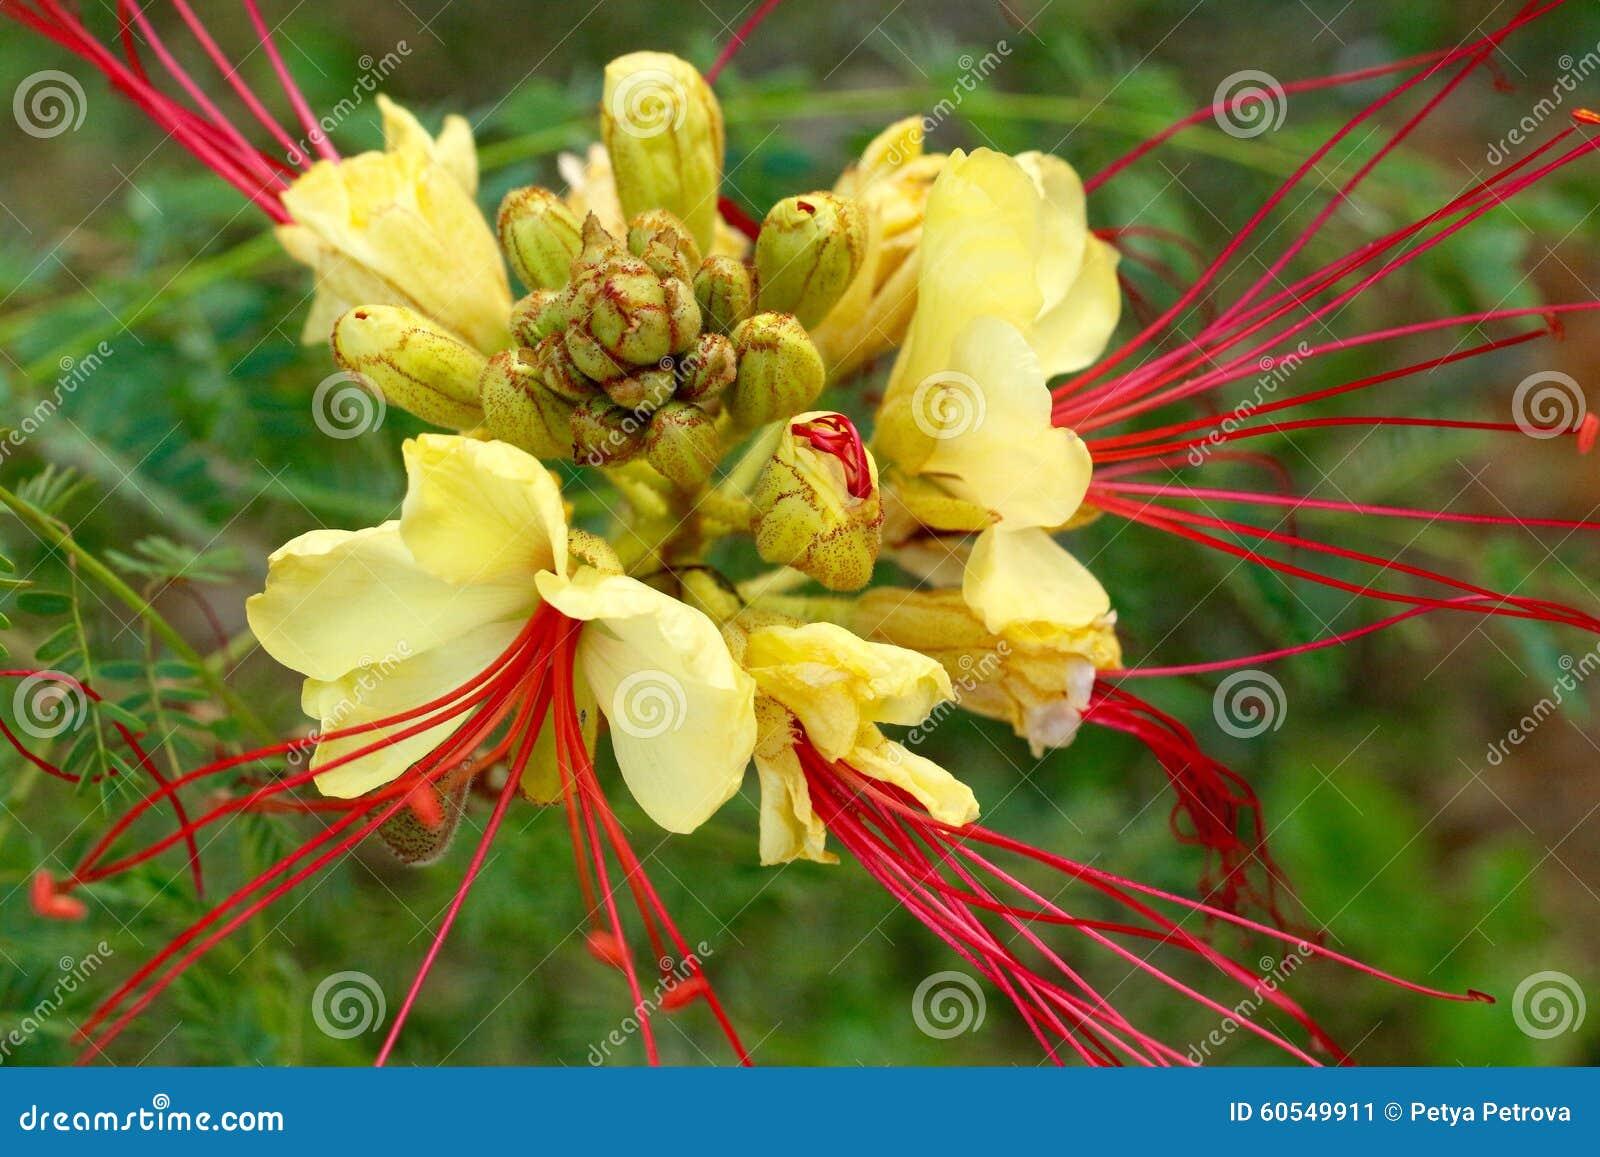 Beautiful yellow flower with long red stamens stock image image of download beautiful yellow flower with long red stamens stock image image of flowering flower mightylinksfo